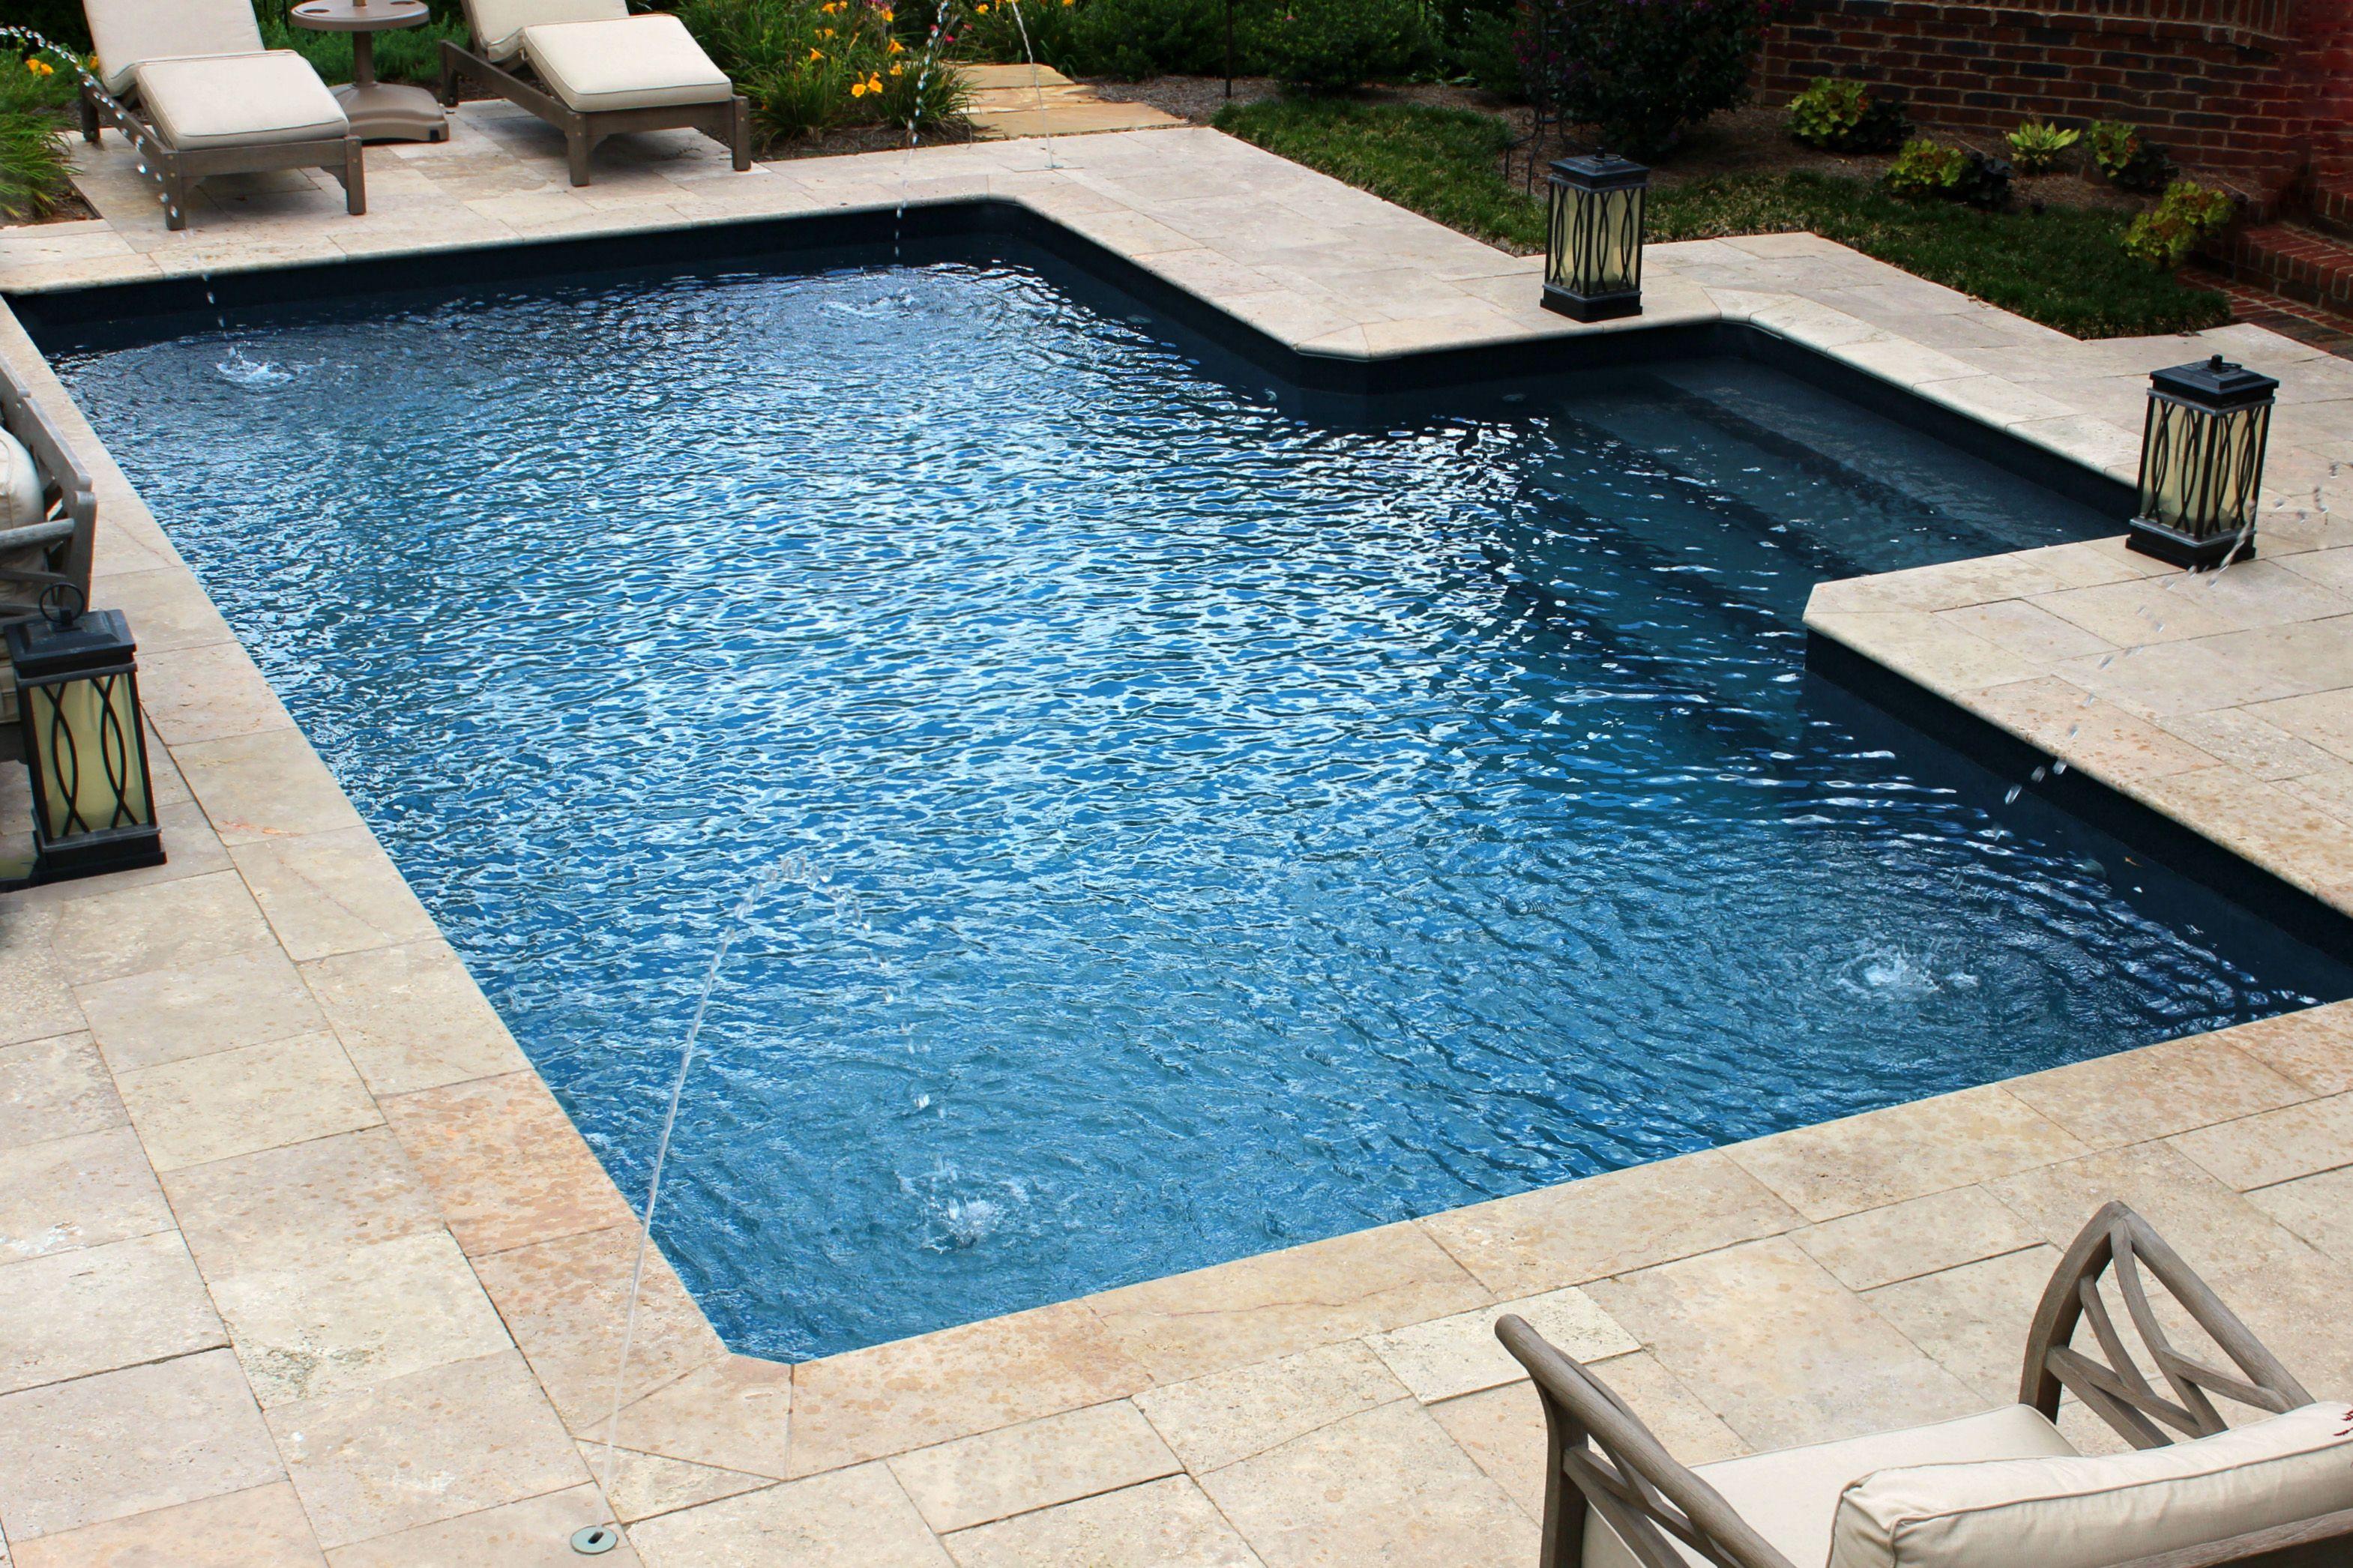 Deep Blue Vinyl Liner Pool Simple Design Stair Entry With Deck